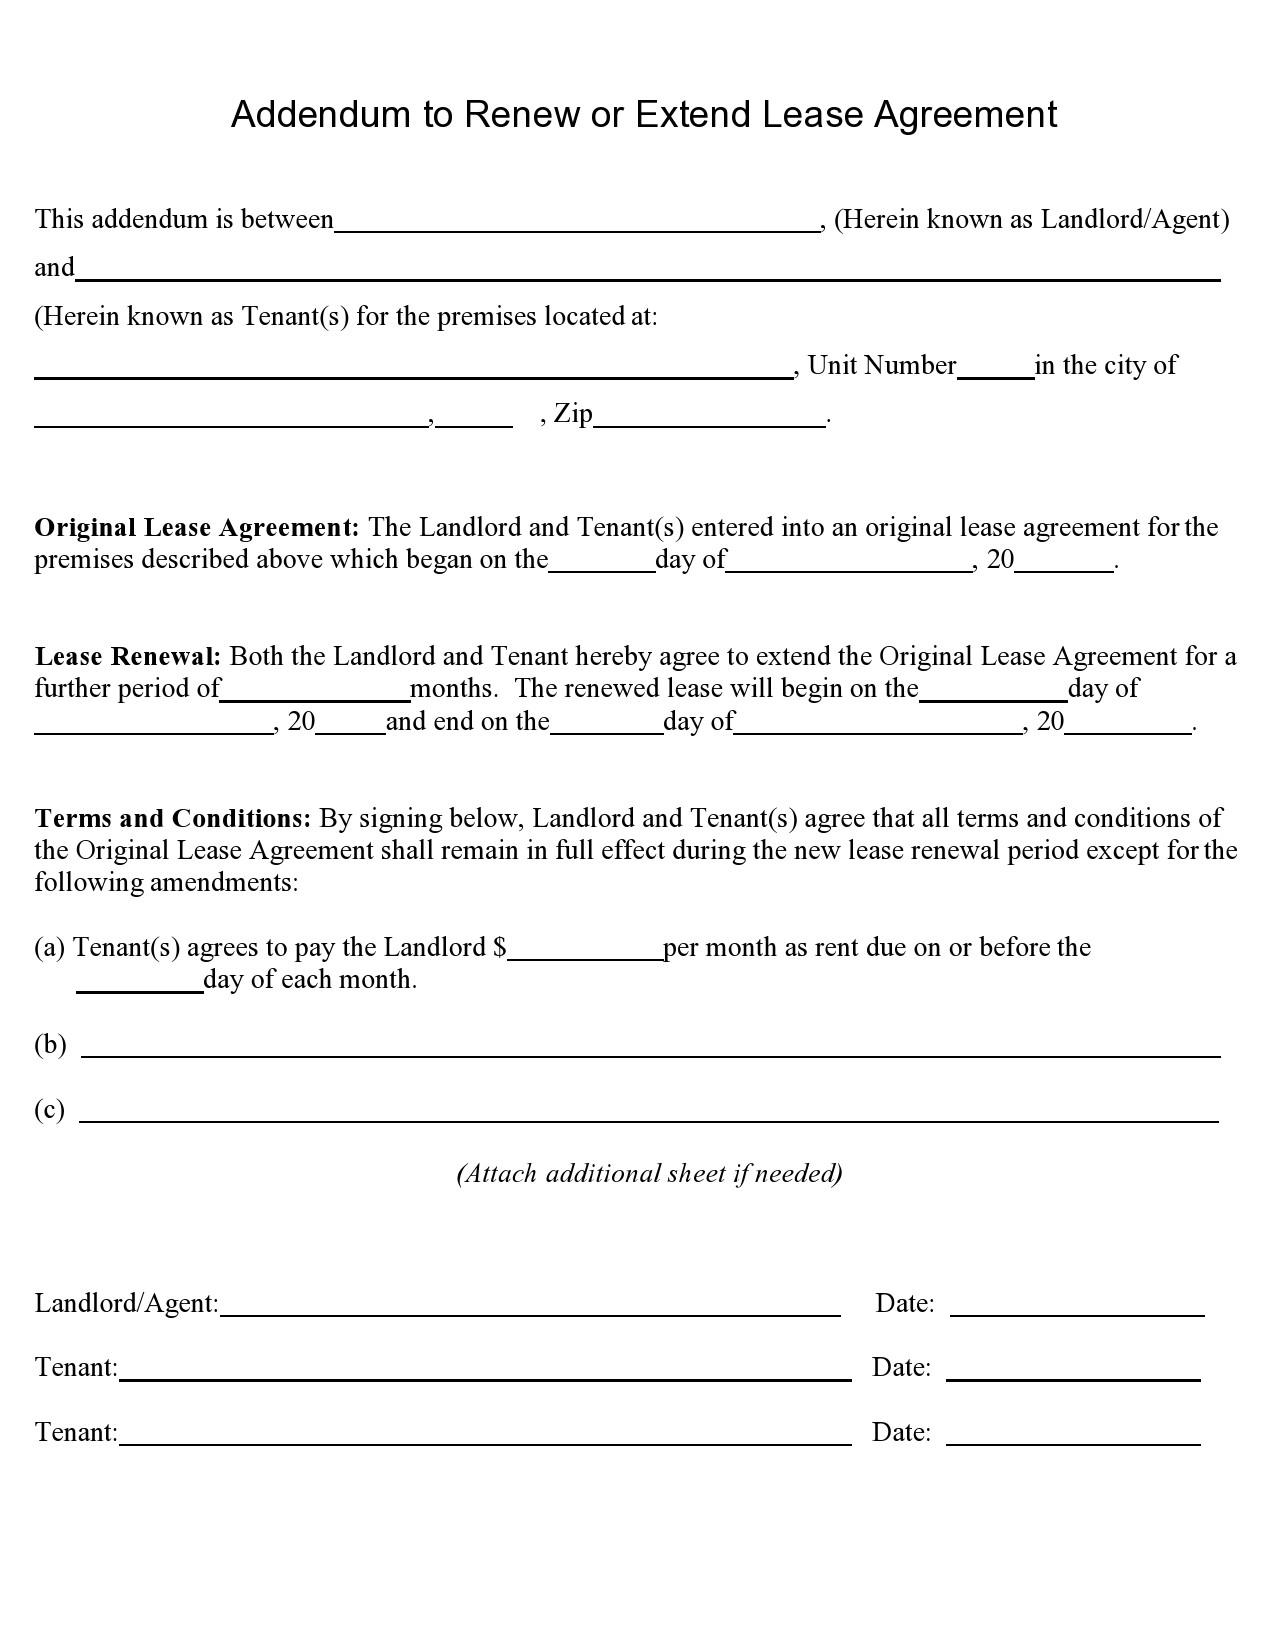 Free lease extension addendum 40